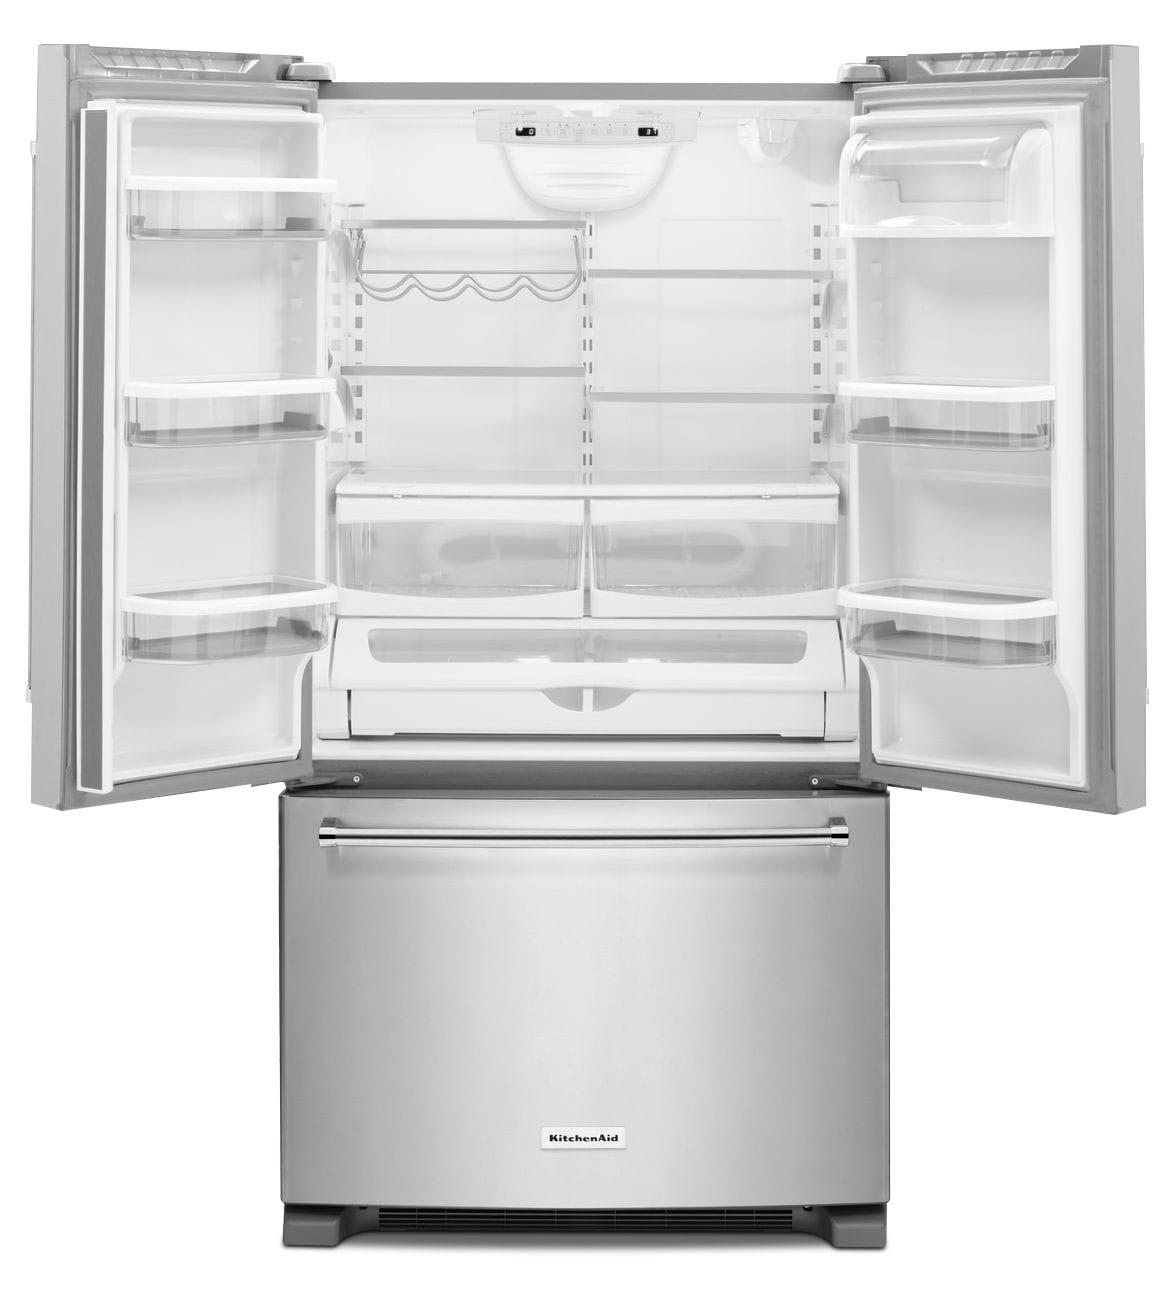 Kitchenaid French Door Refrigerator: KitchenAid Stainless Steel French Door Refrigerator (20 Cu